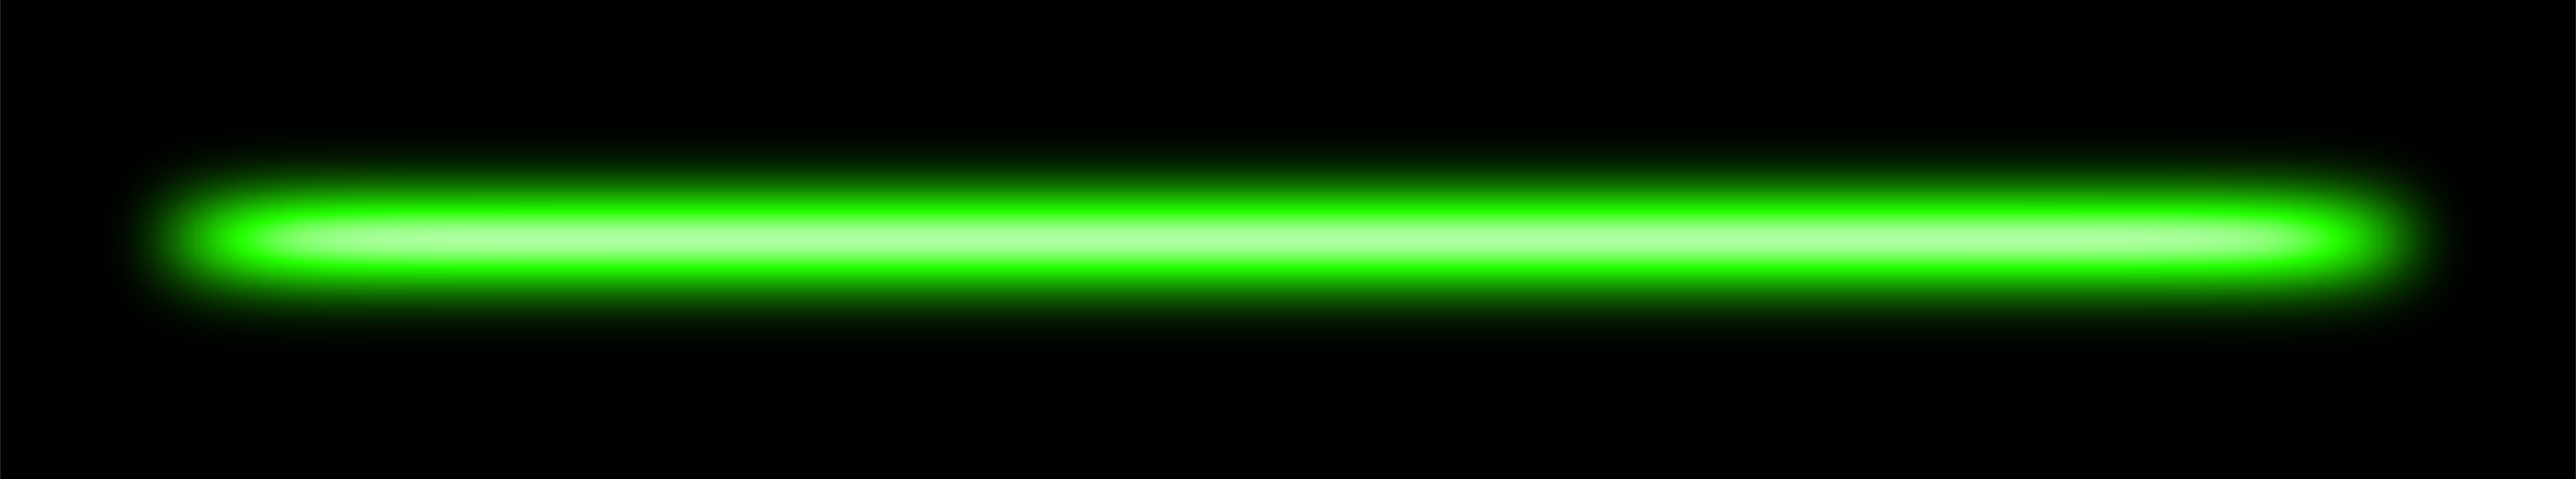 520 nm (green) uniform laser line